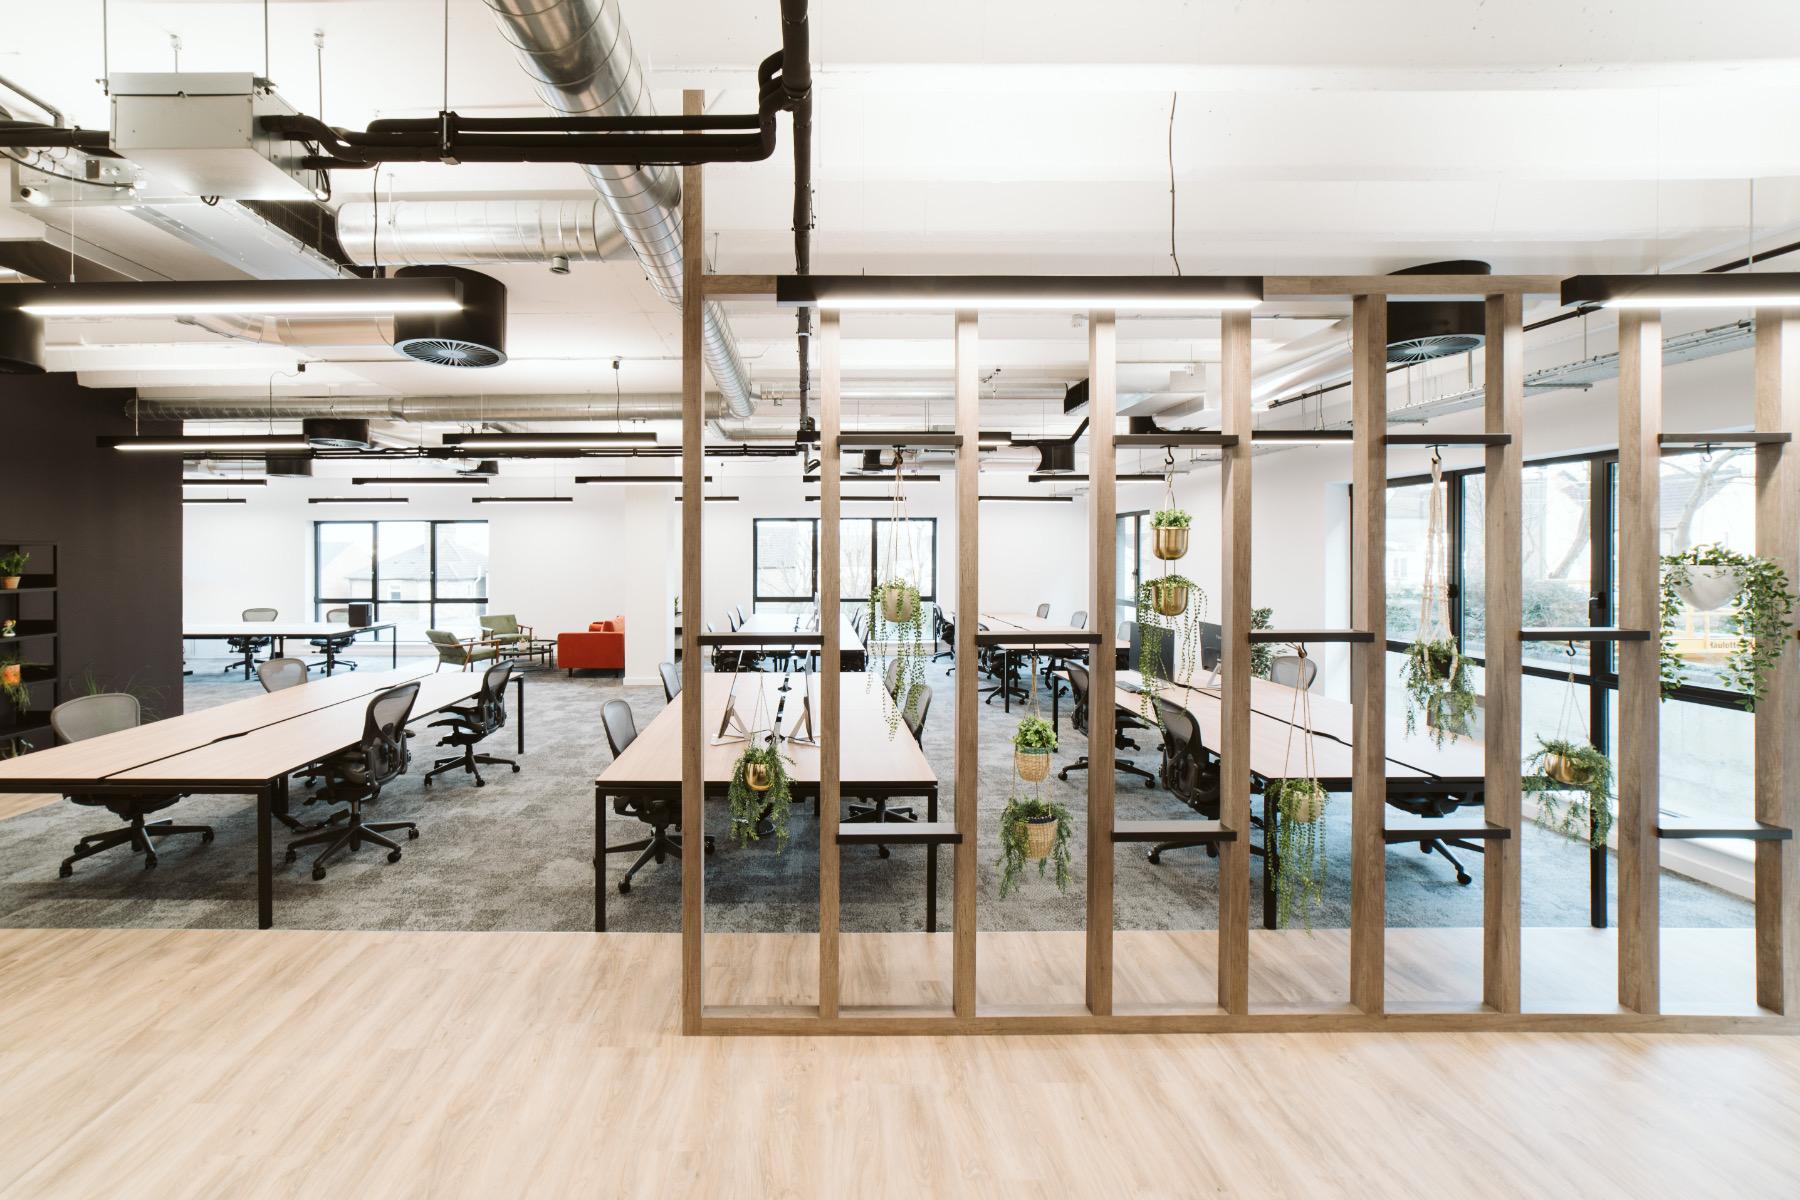 A Look Inside 15 Marketing's New Watford Office